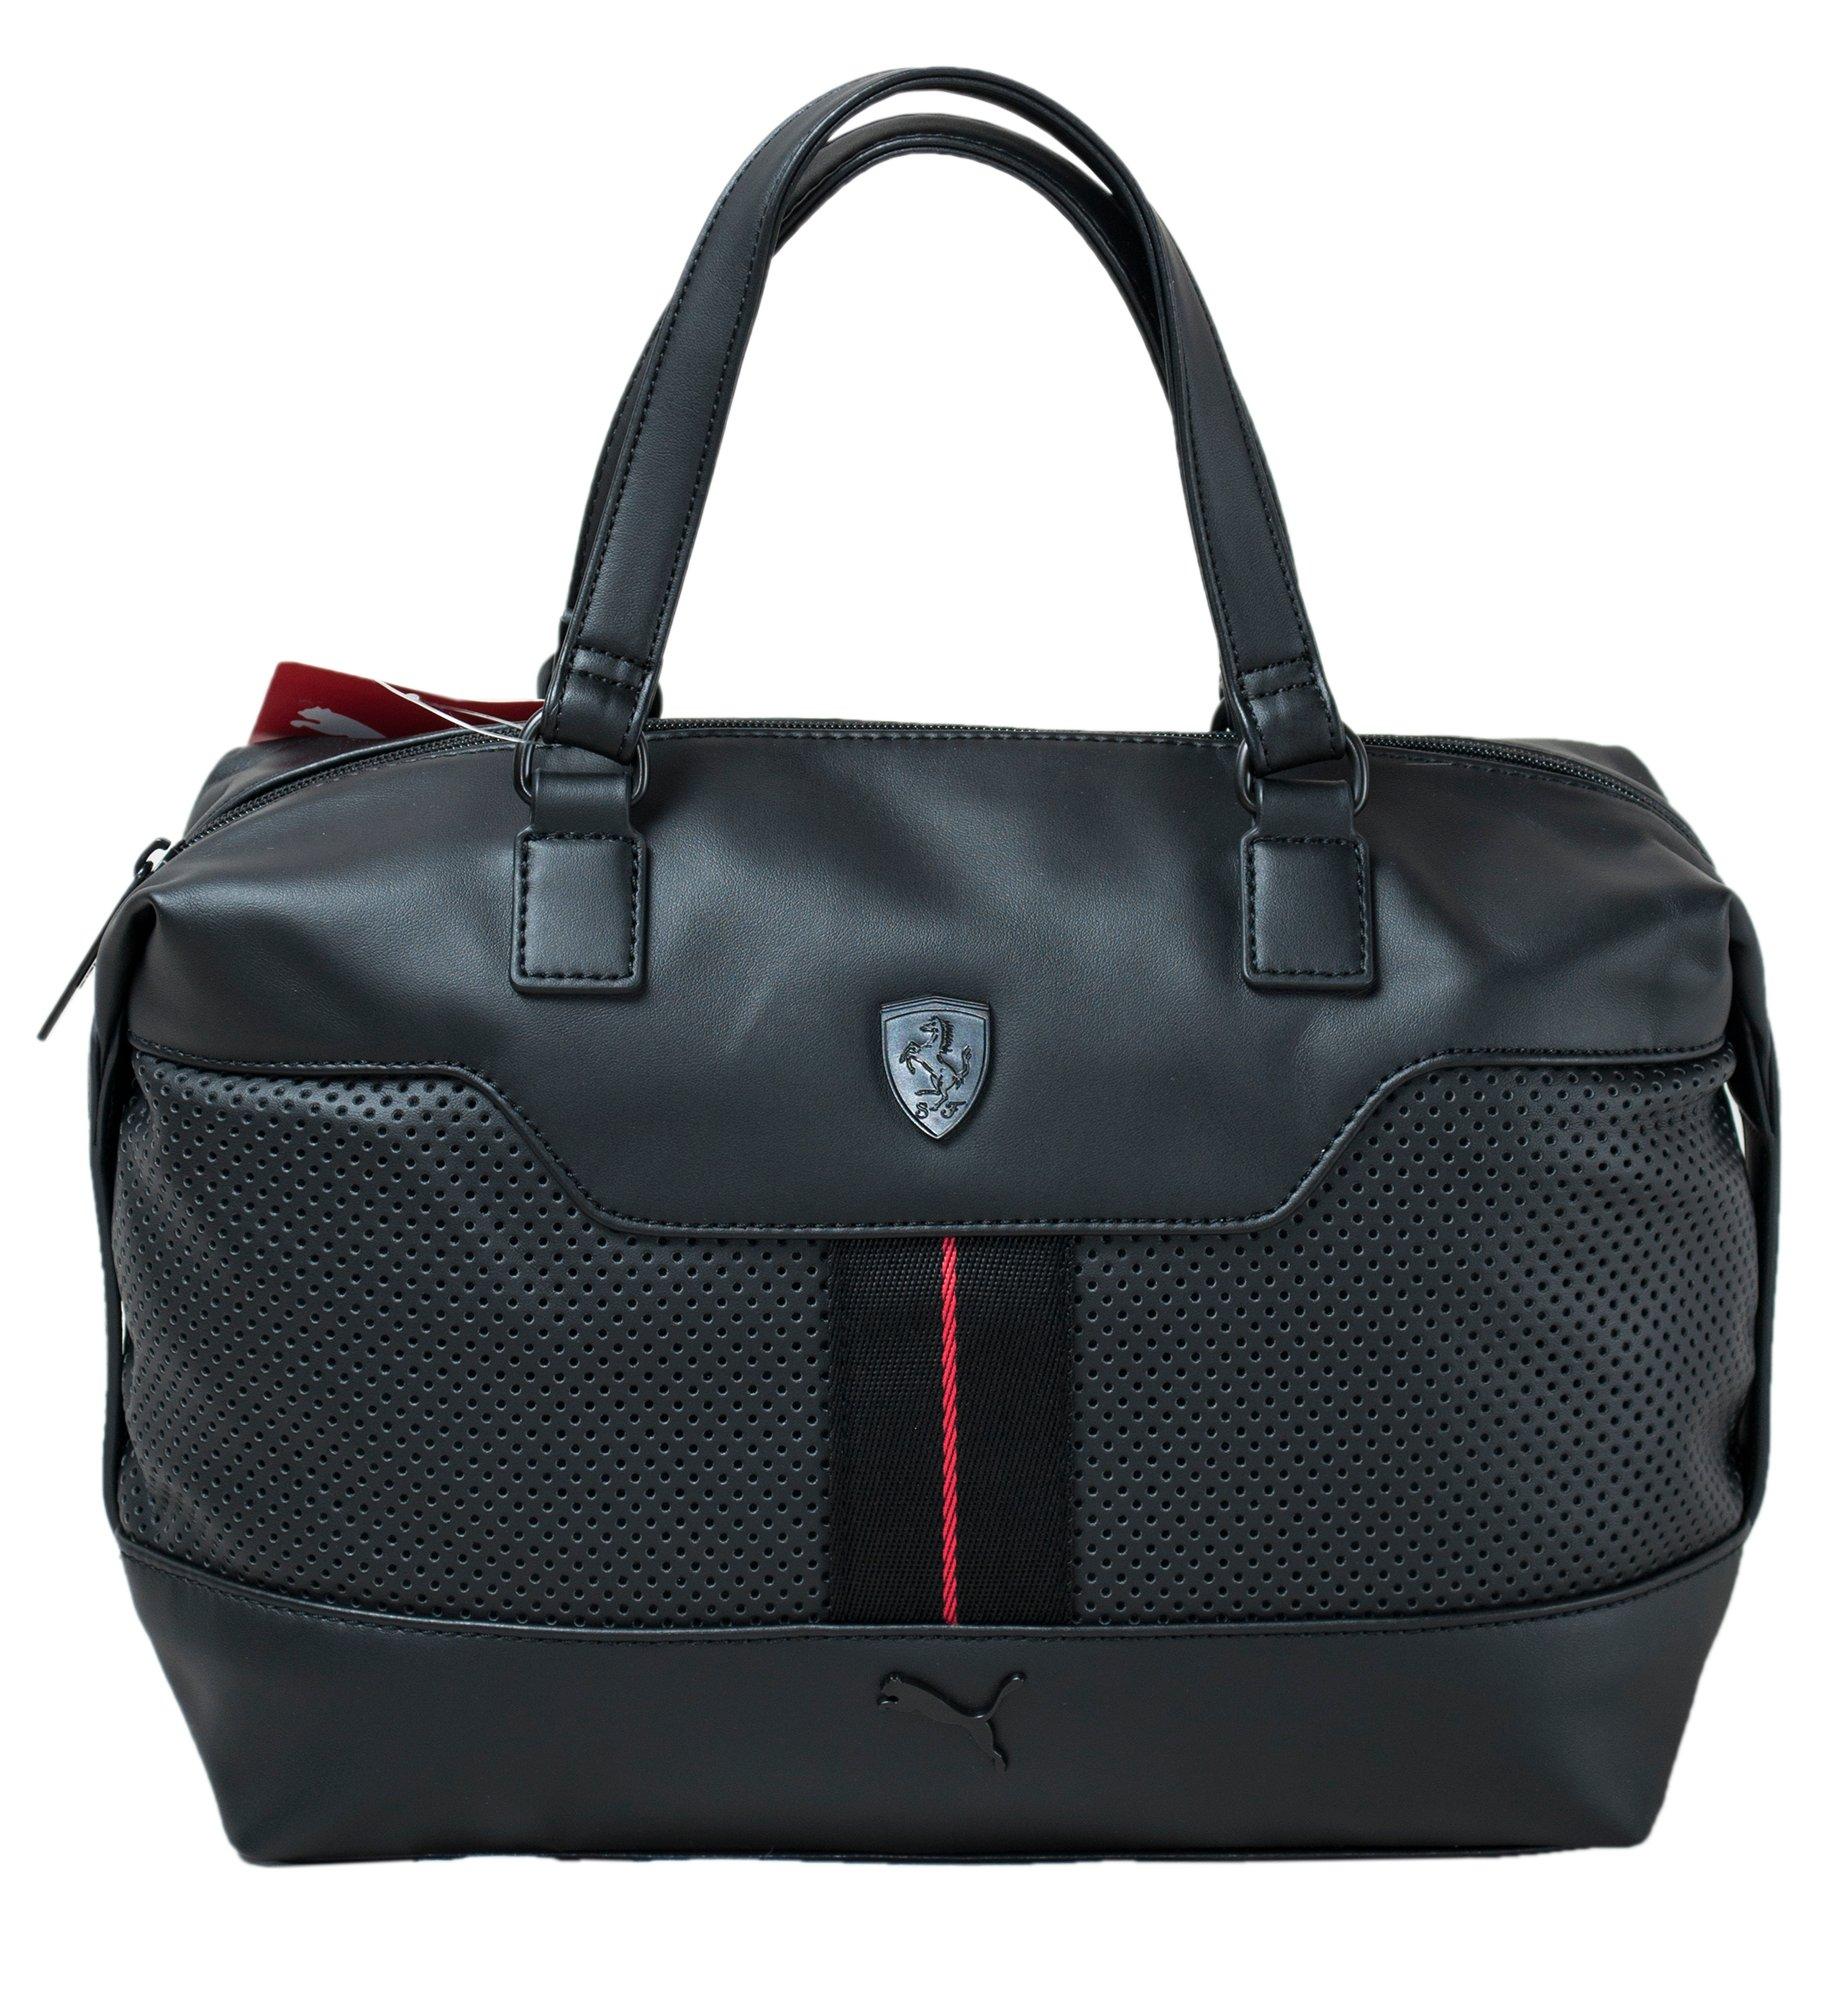 97e06074e33b6 FERRARI PUMA EKSKLUZYWNA torebka torba SUPER CENA na Bazarek.pl